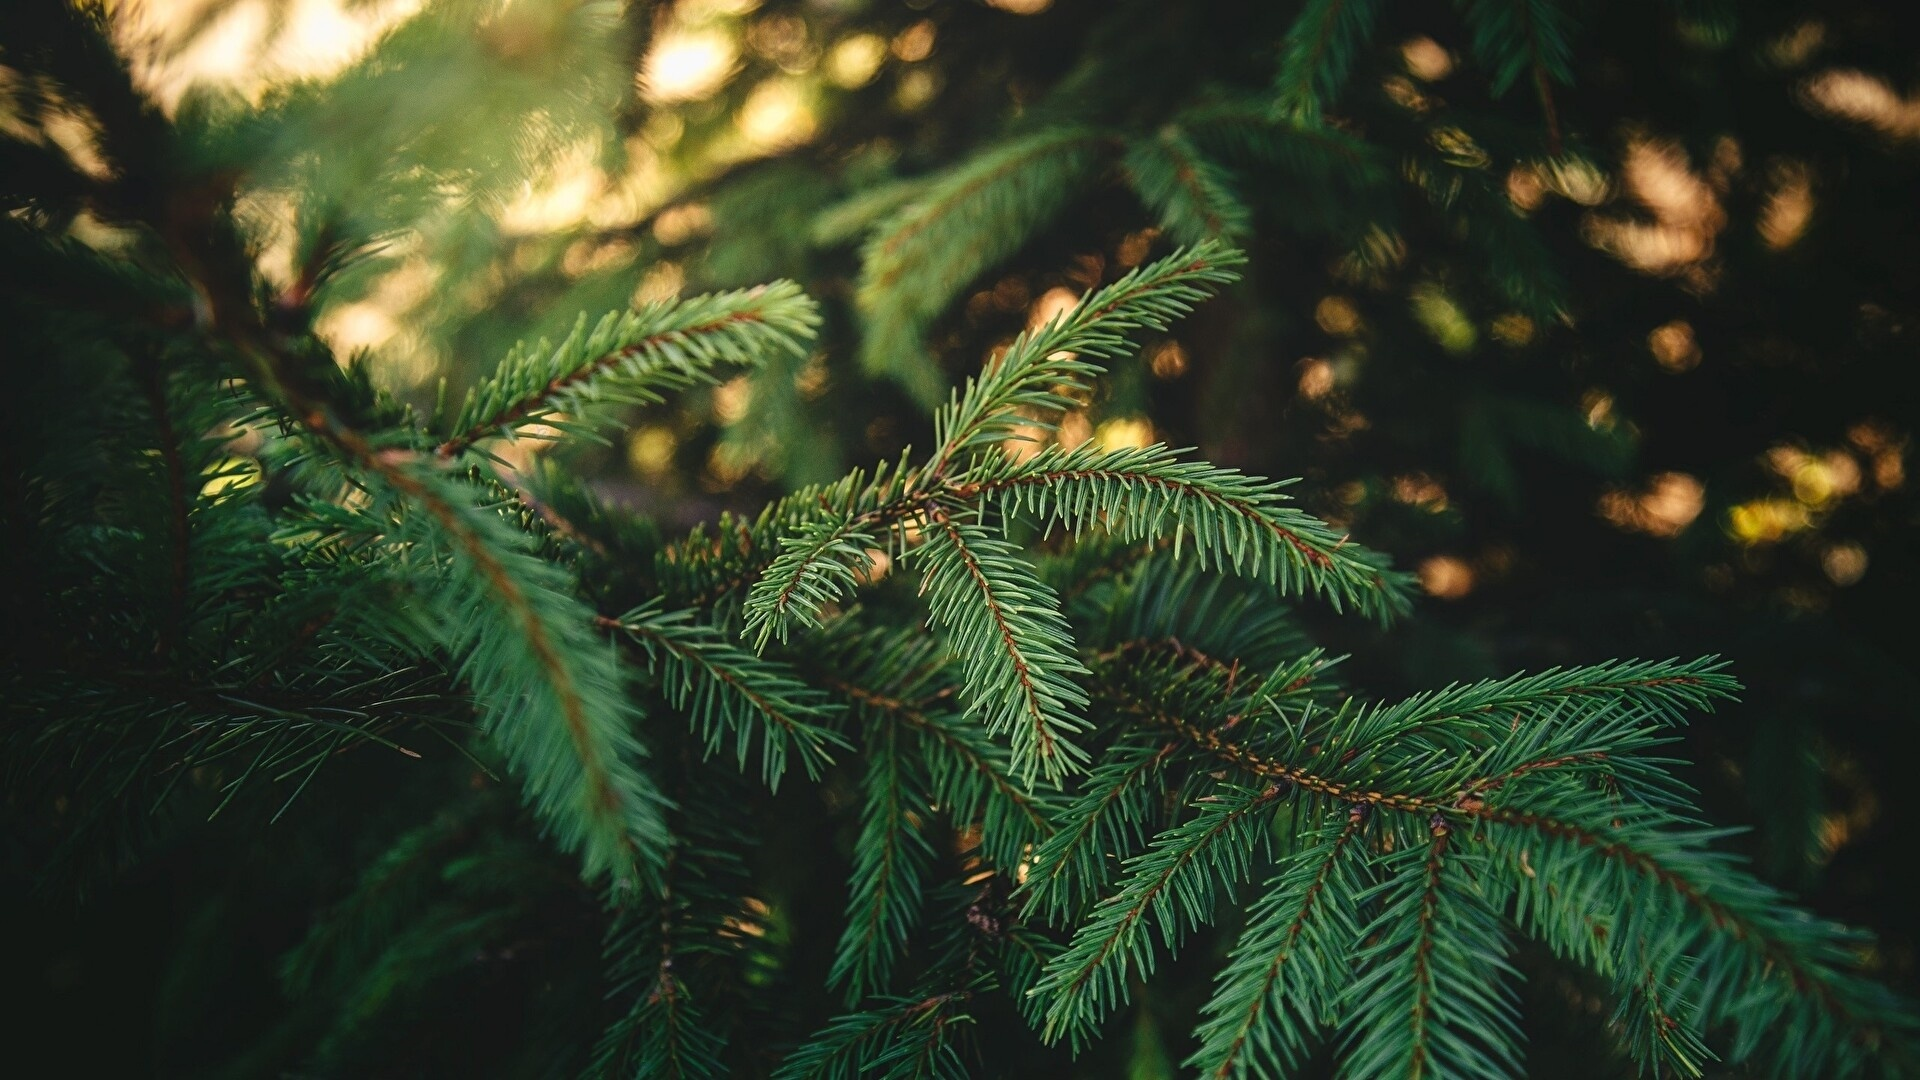 Spruce Branches wallpaper for desktop